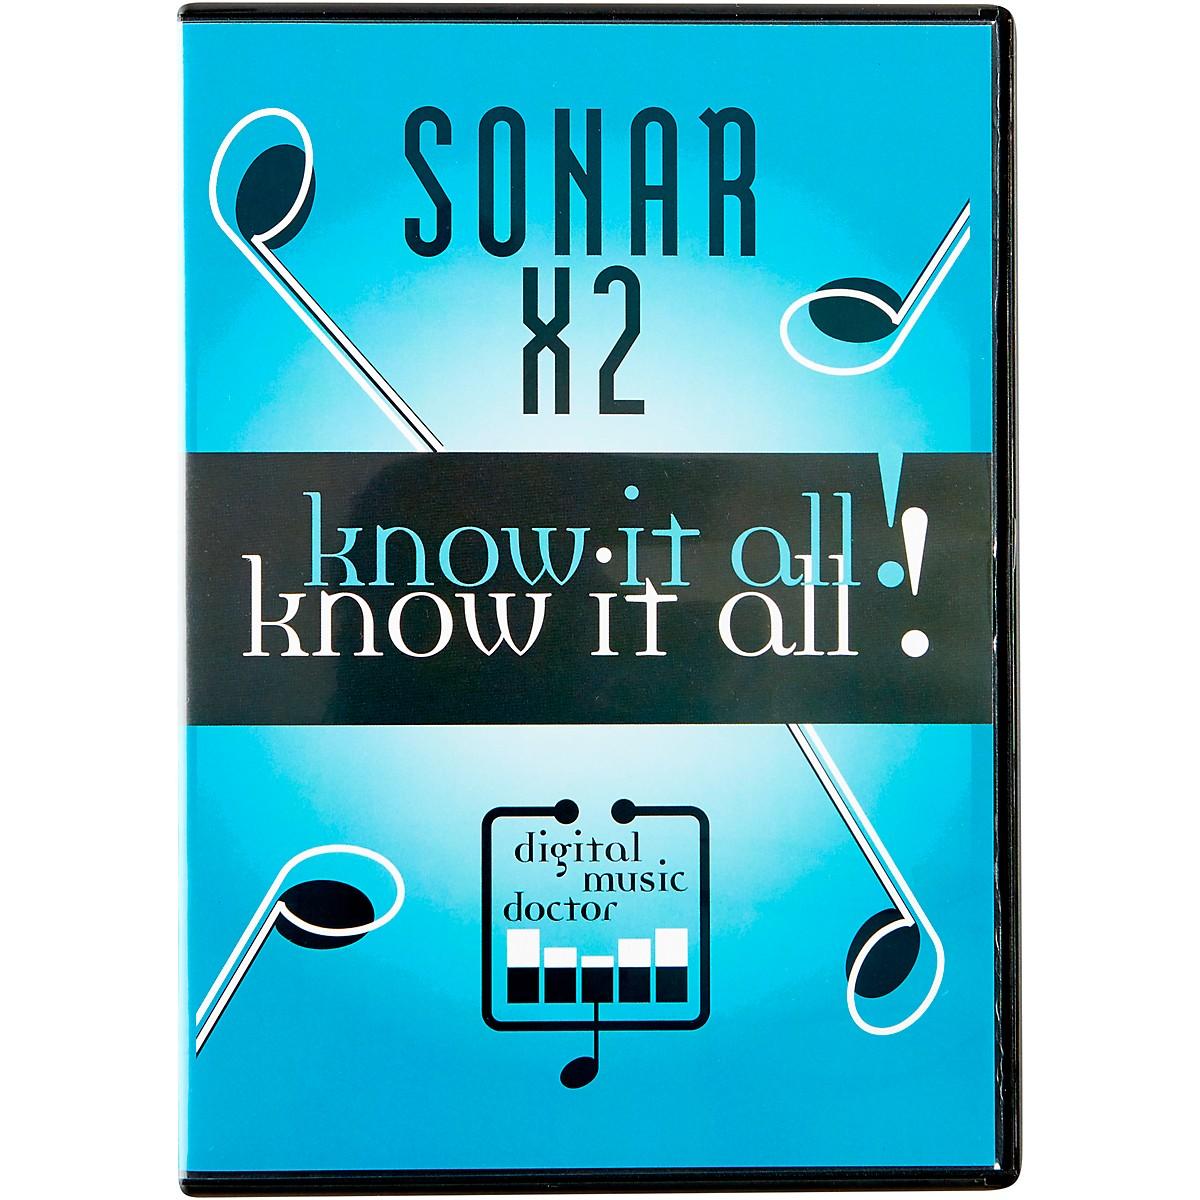 Digital Music Doctor Sonar X2 Know It All! DVD